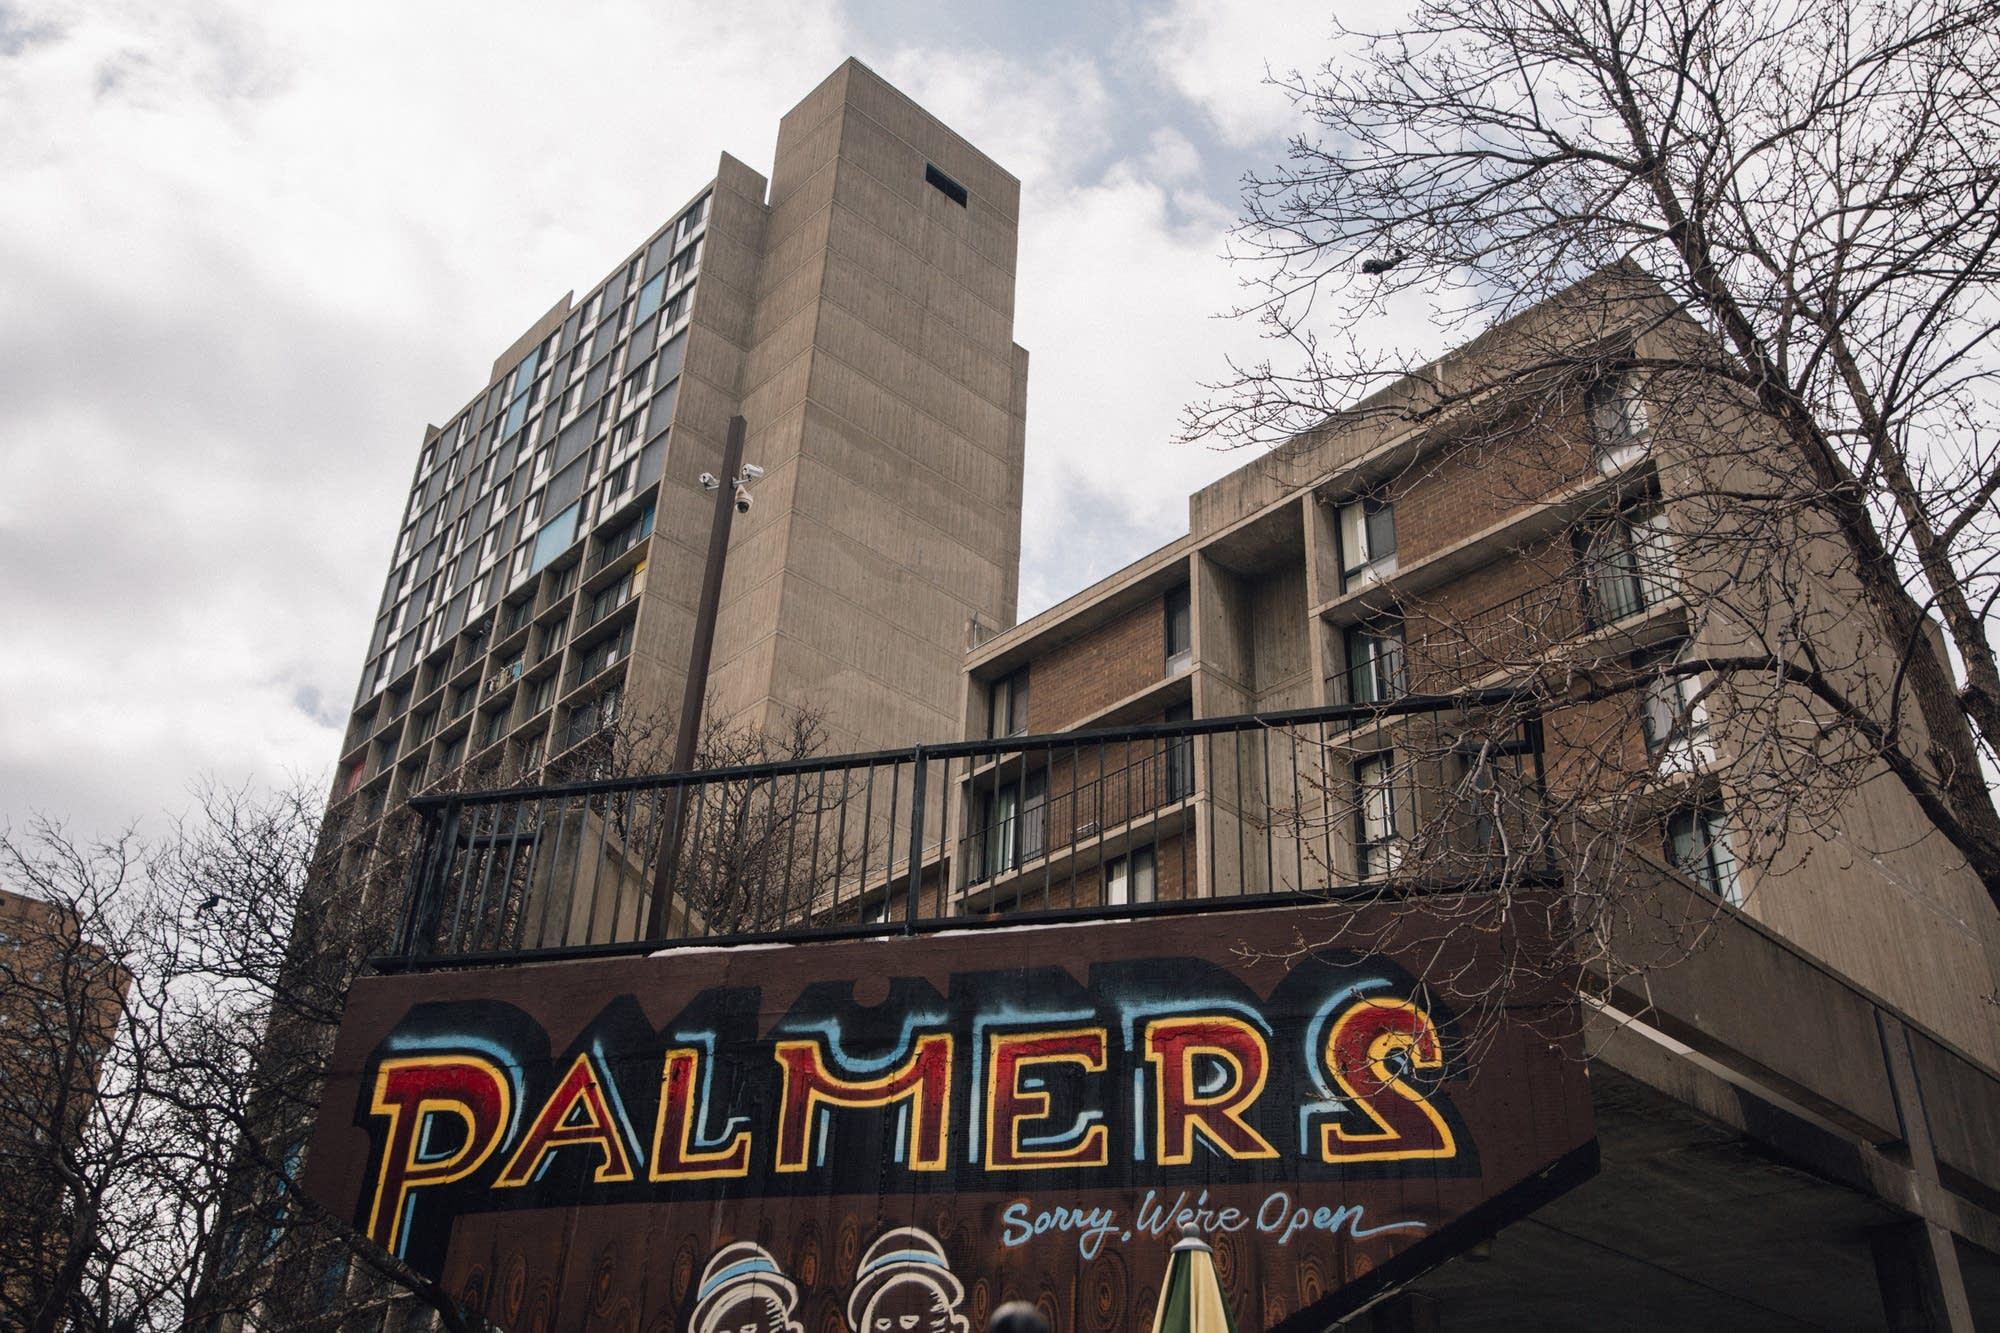 Outside Minneapolis' Palmer's Bar.